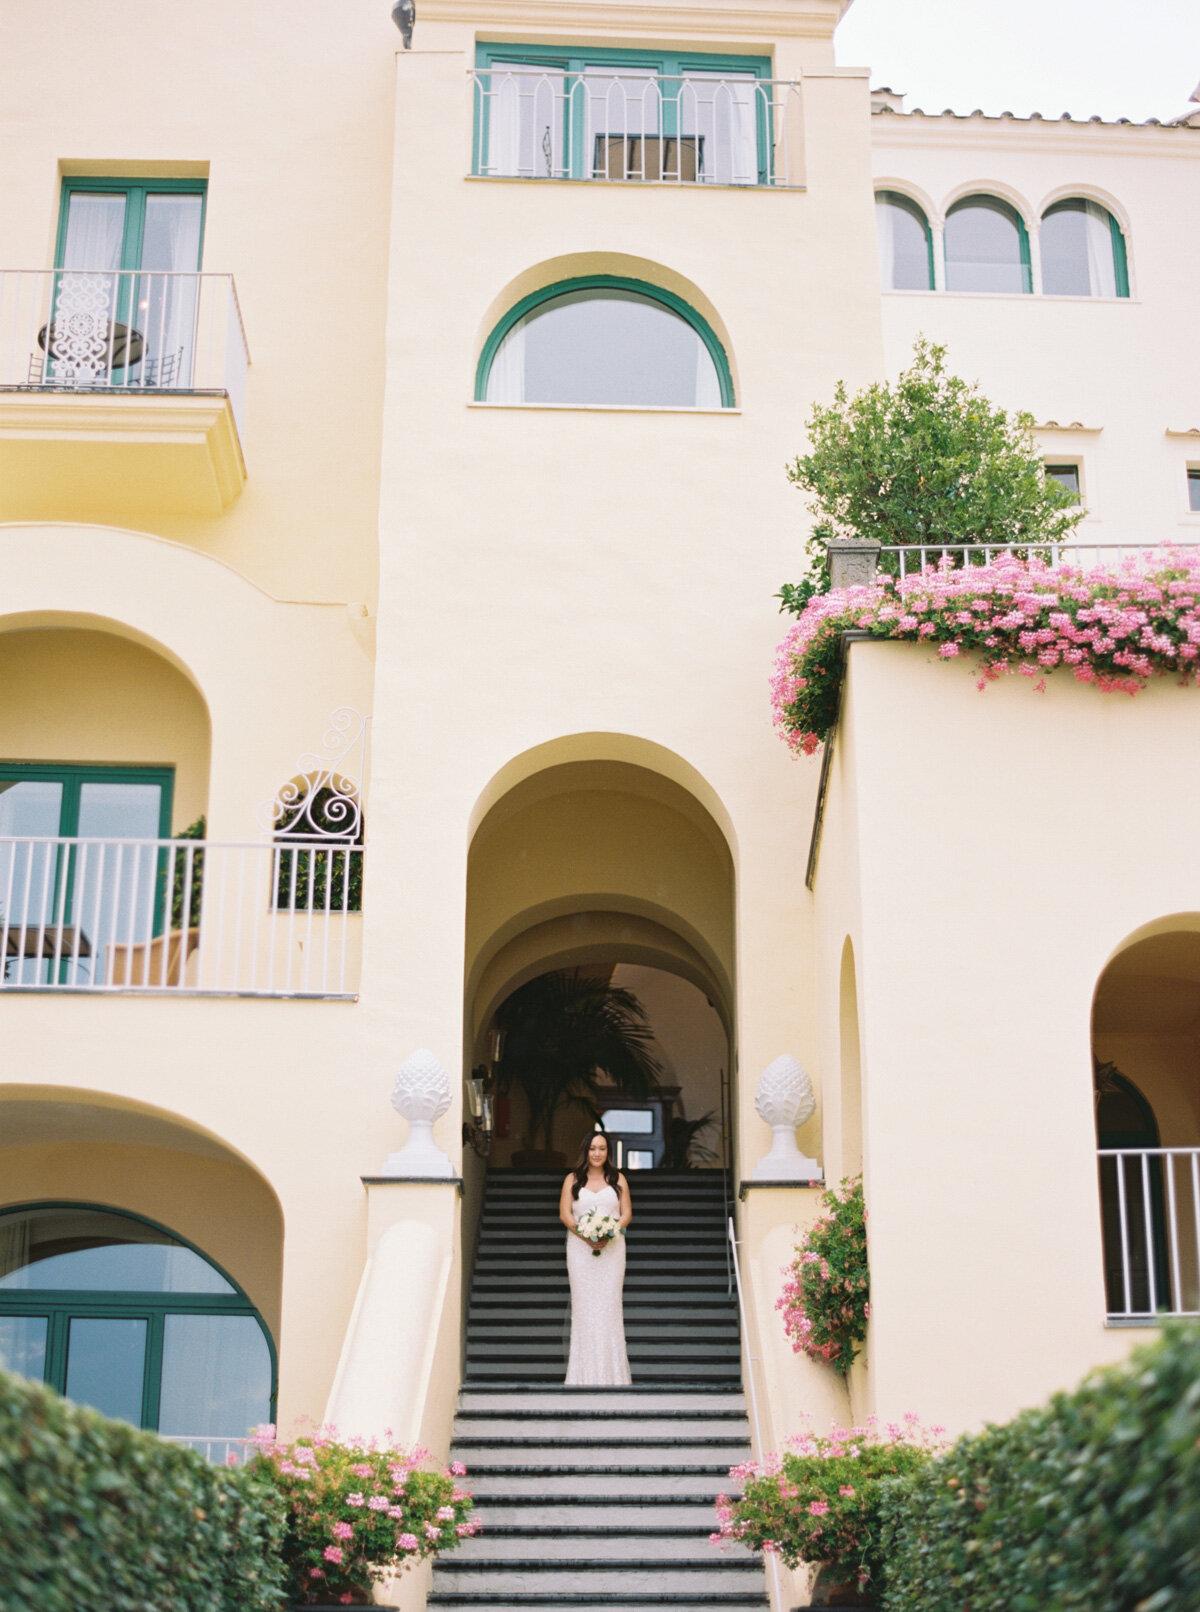 Belmond-Hotel-Caruso-ravello-elopement-Katie-Grant-destination-wedding (19 of 50).jpg